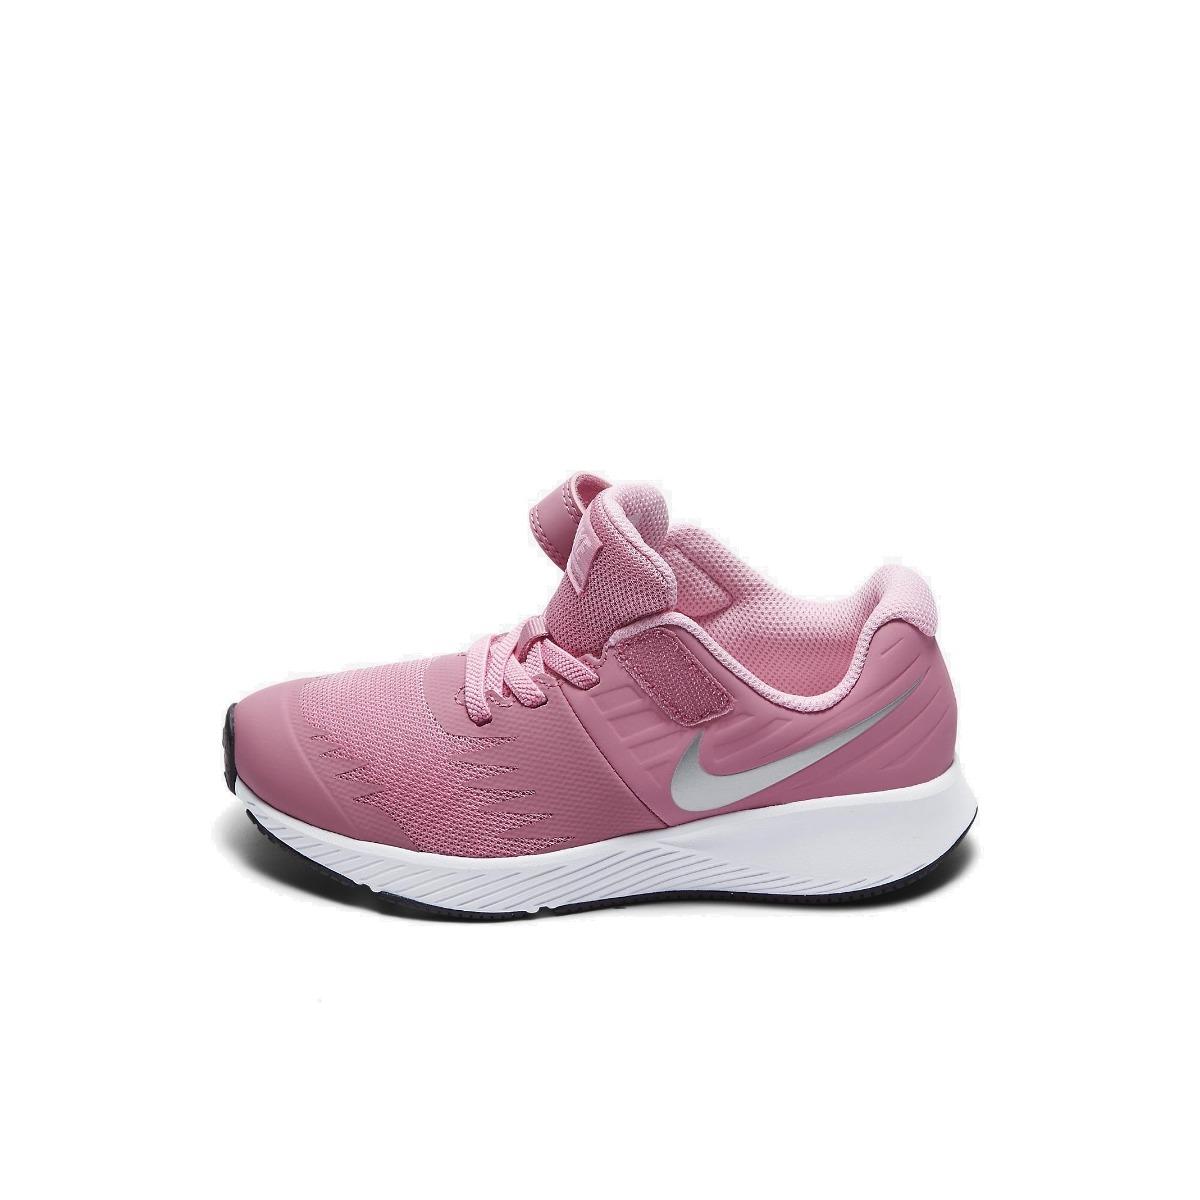 1bbe0dec784 tênis nike infantil star runner rosa menina 921442601. Carregando zoom.